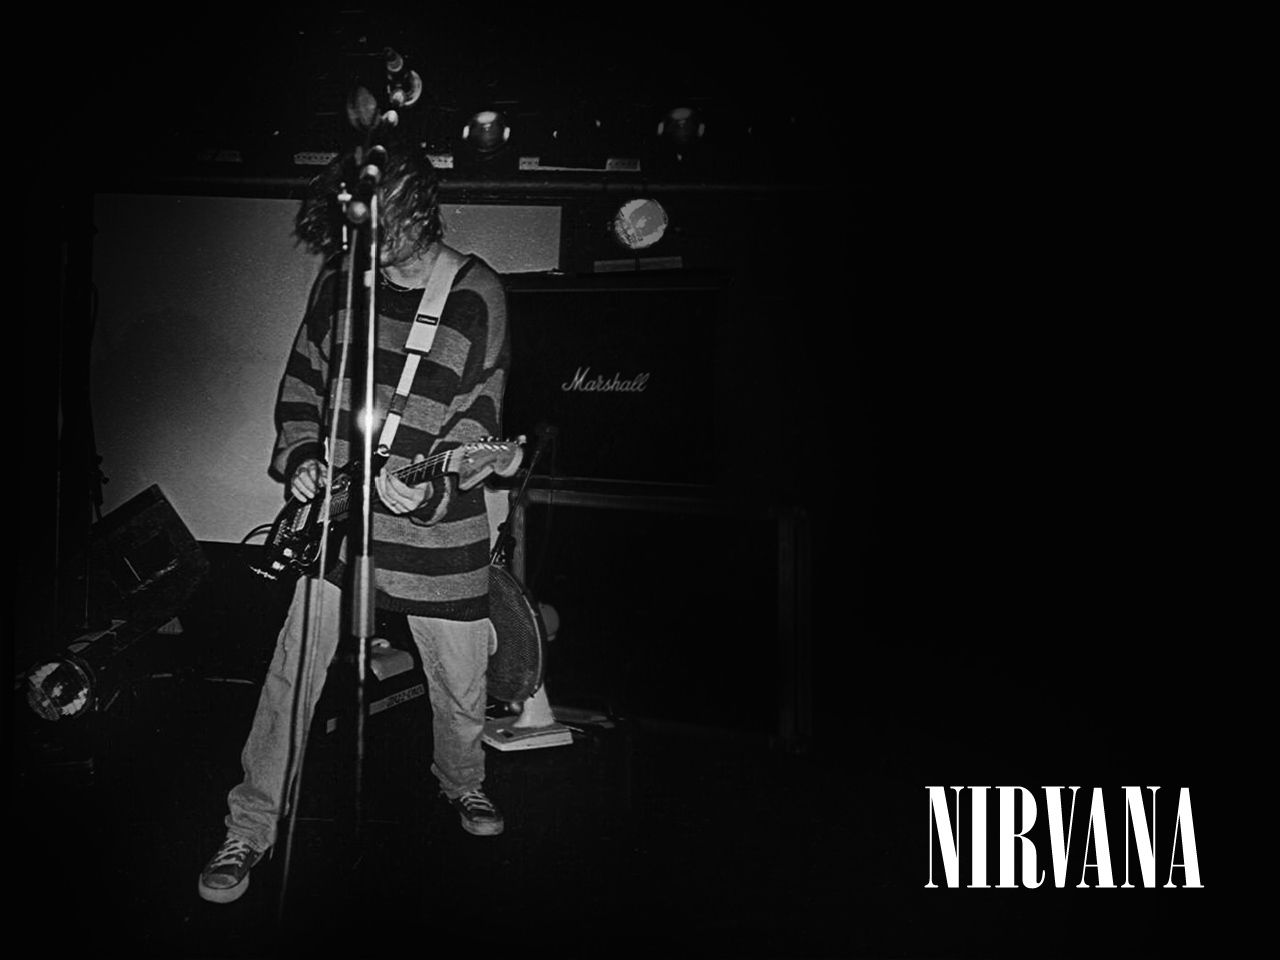 Nirvana Full HD Wallpapers download free HD Wallpapers